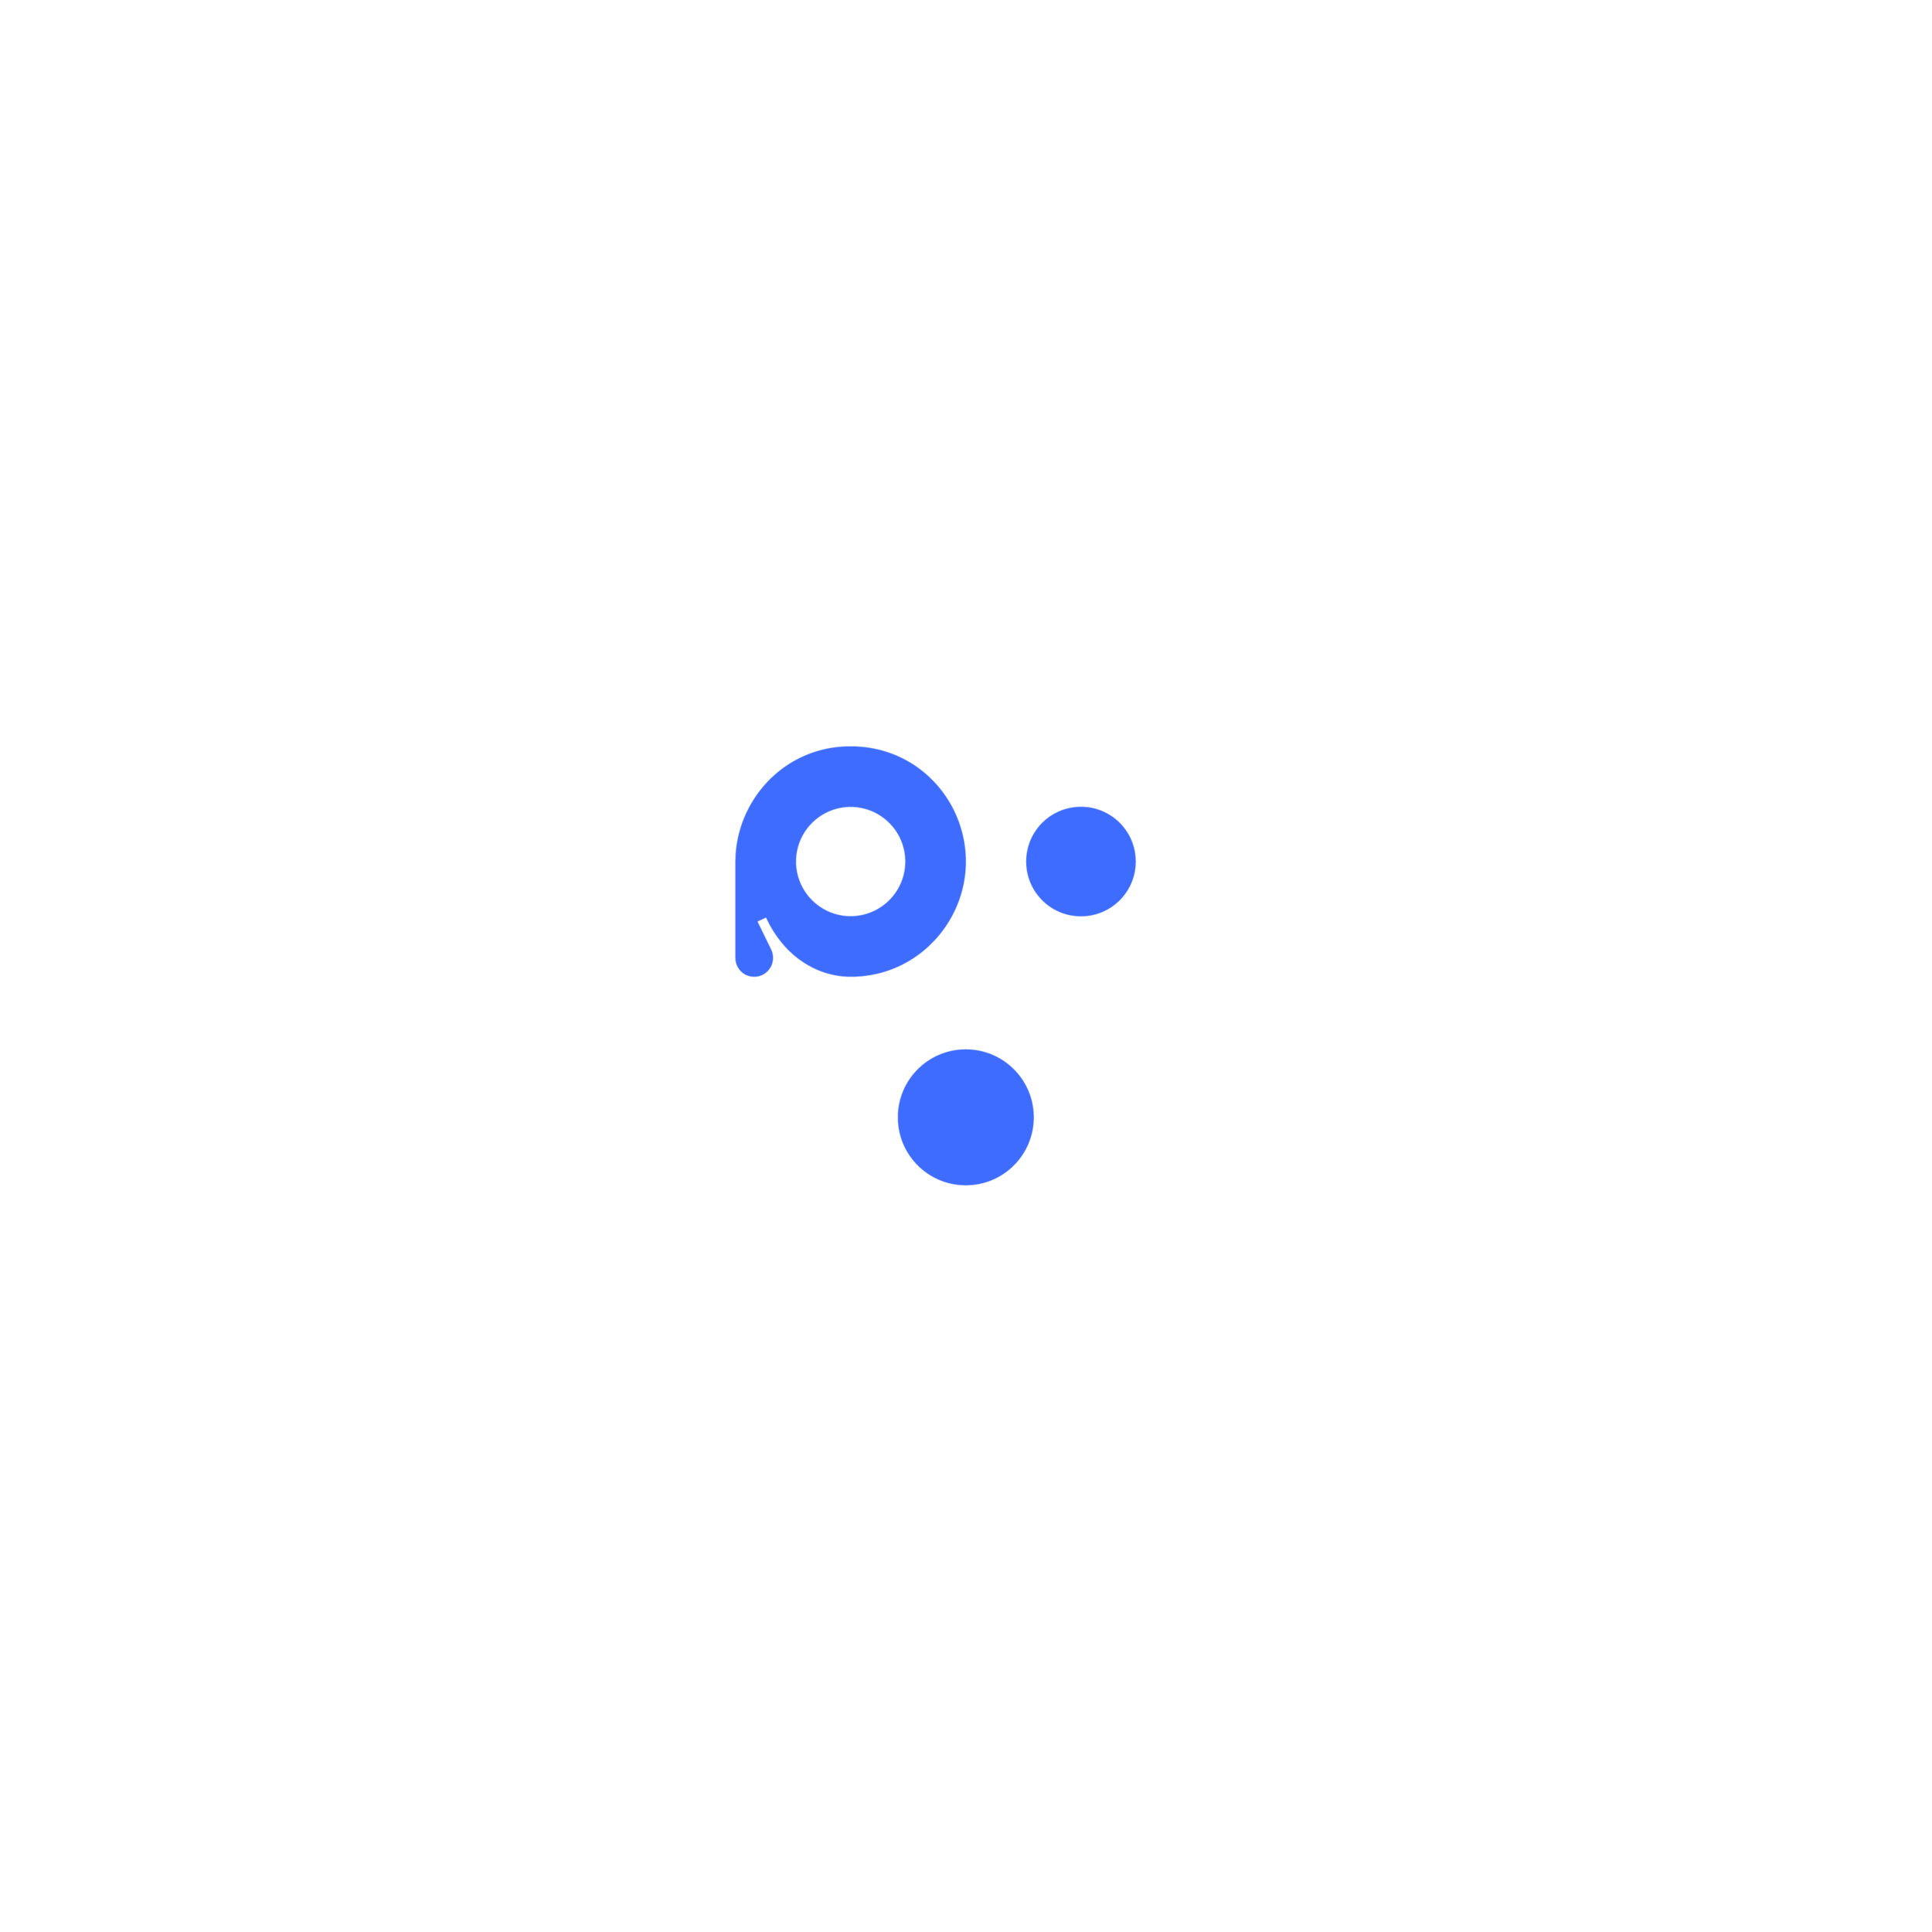 Dogdrop_Social Media Assets-16-01.png